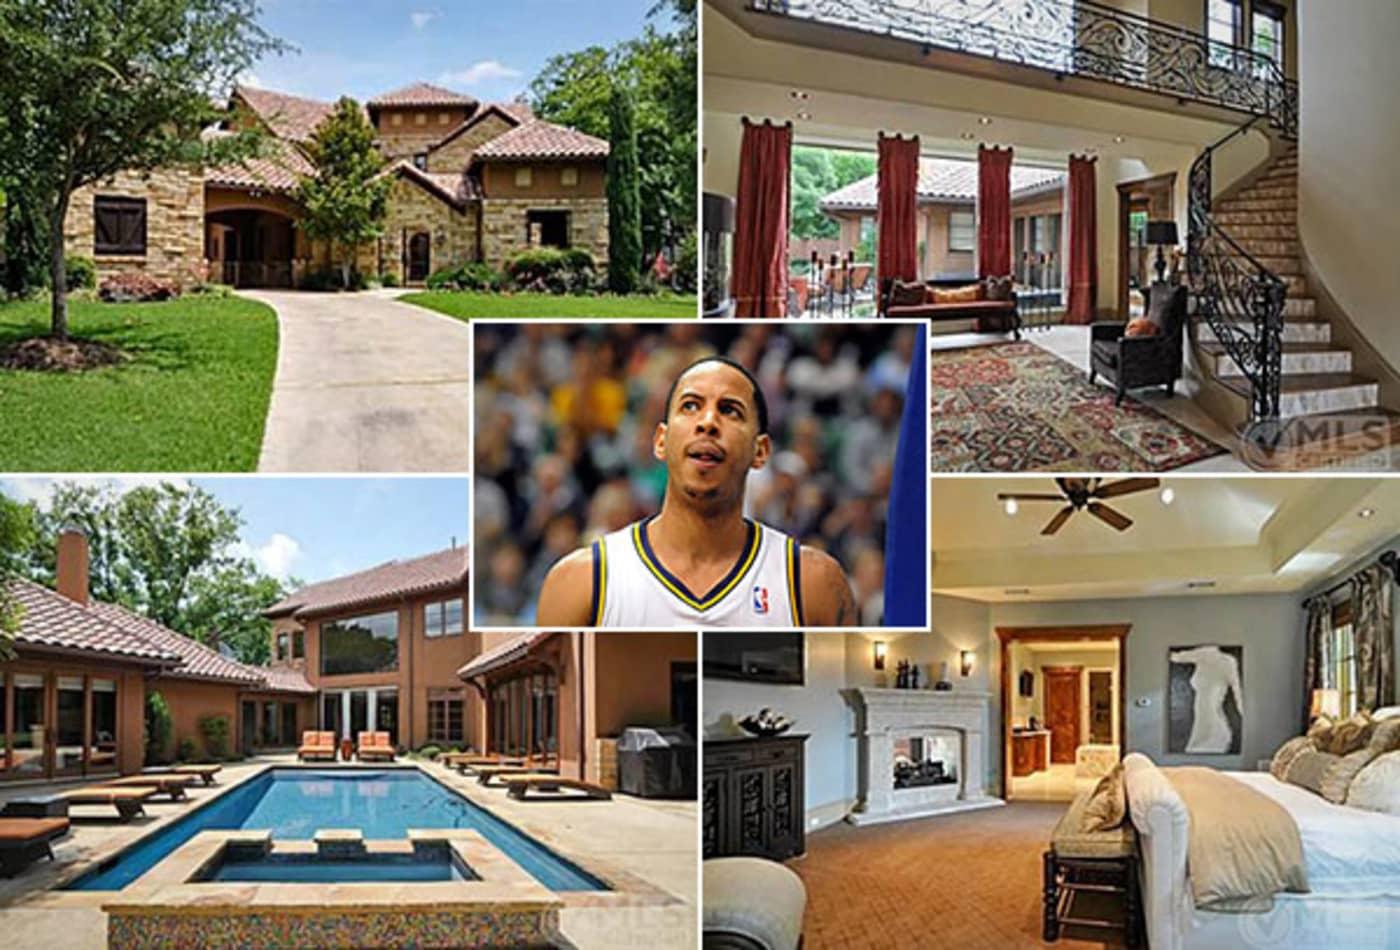 Devin-Harris-Coolest-Athlete-Homes.jpg